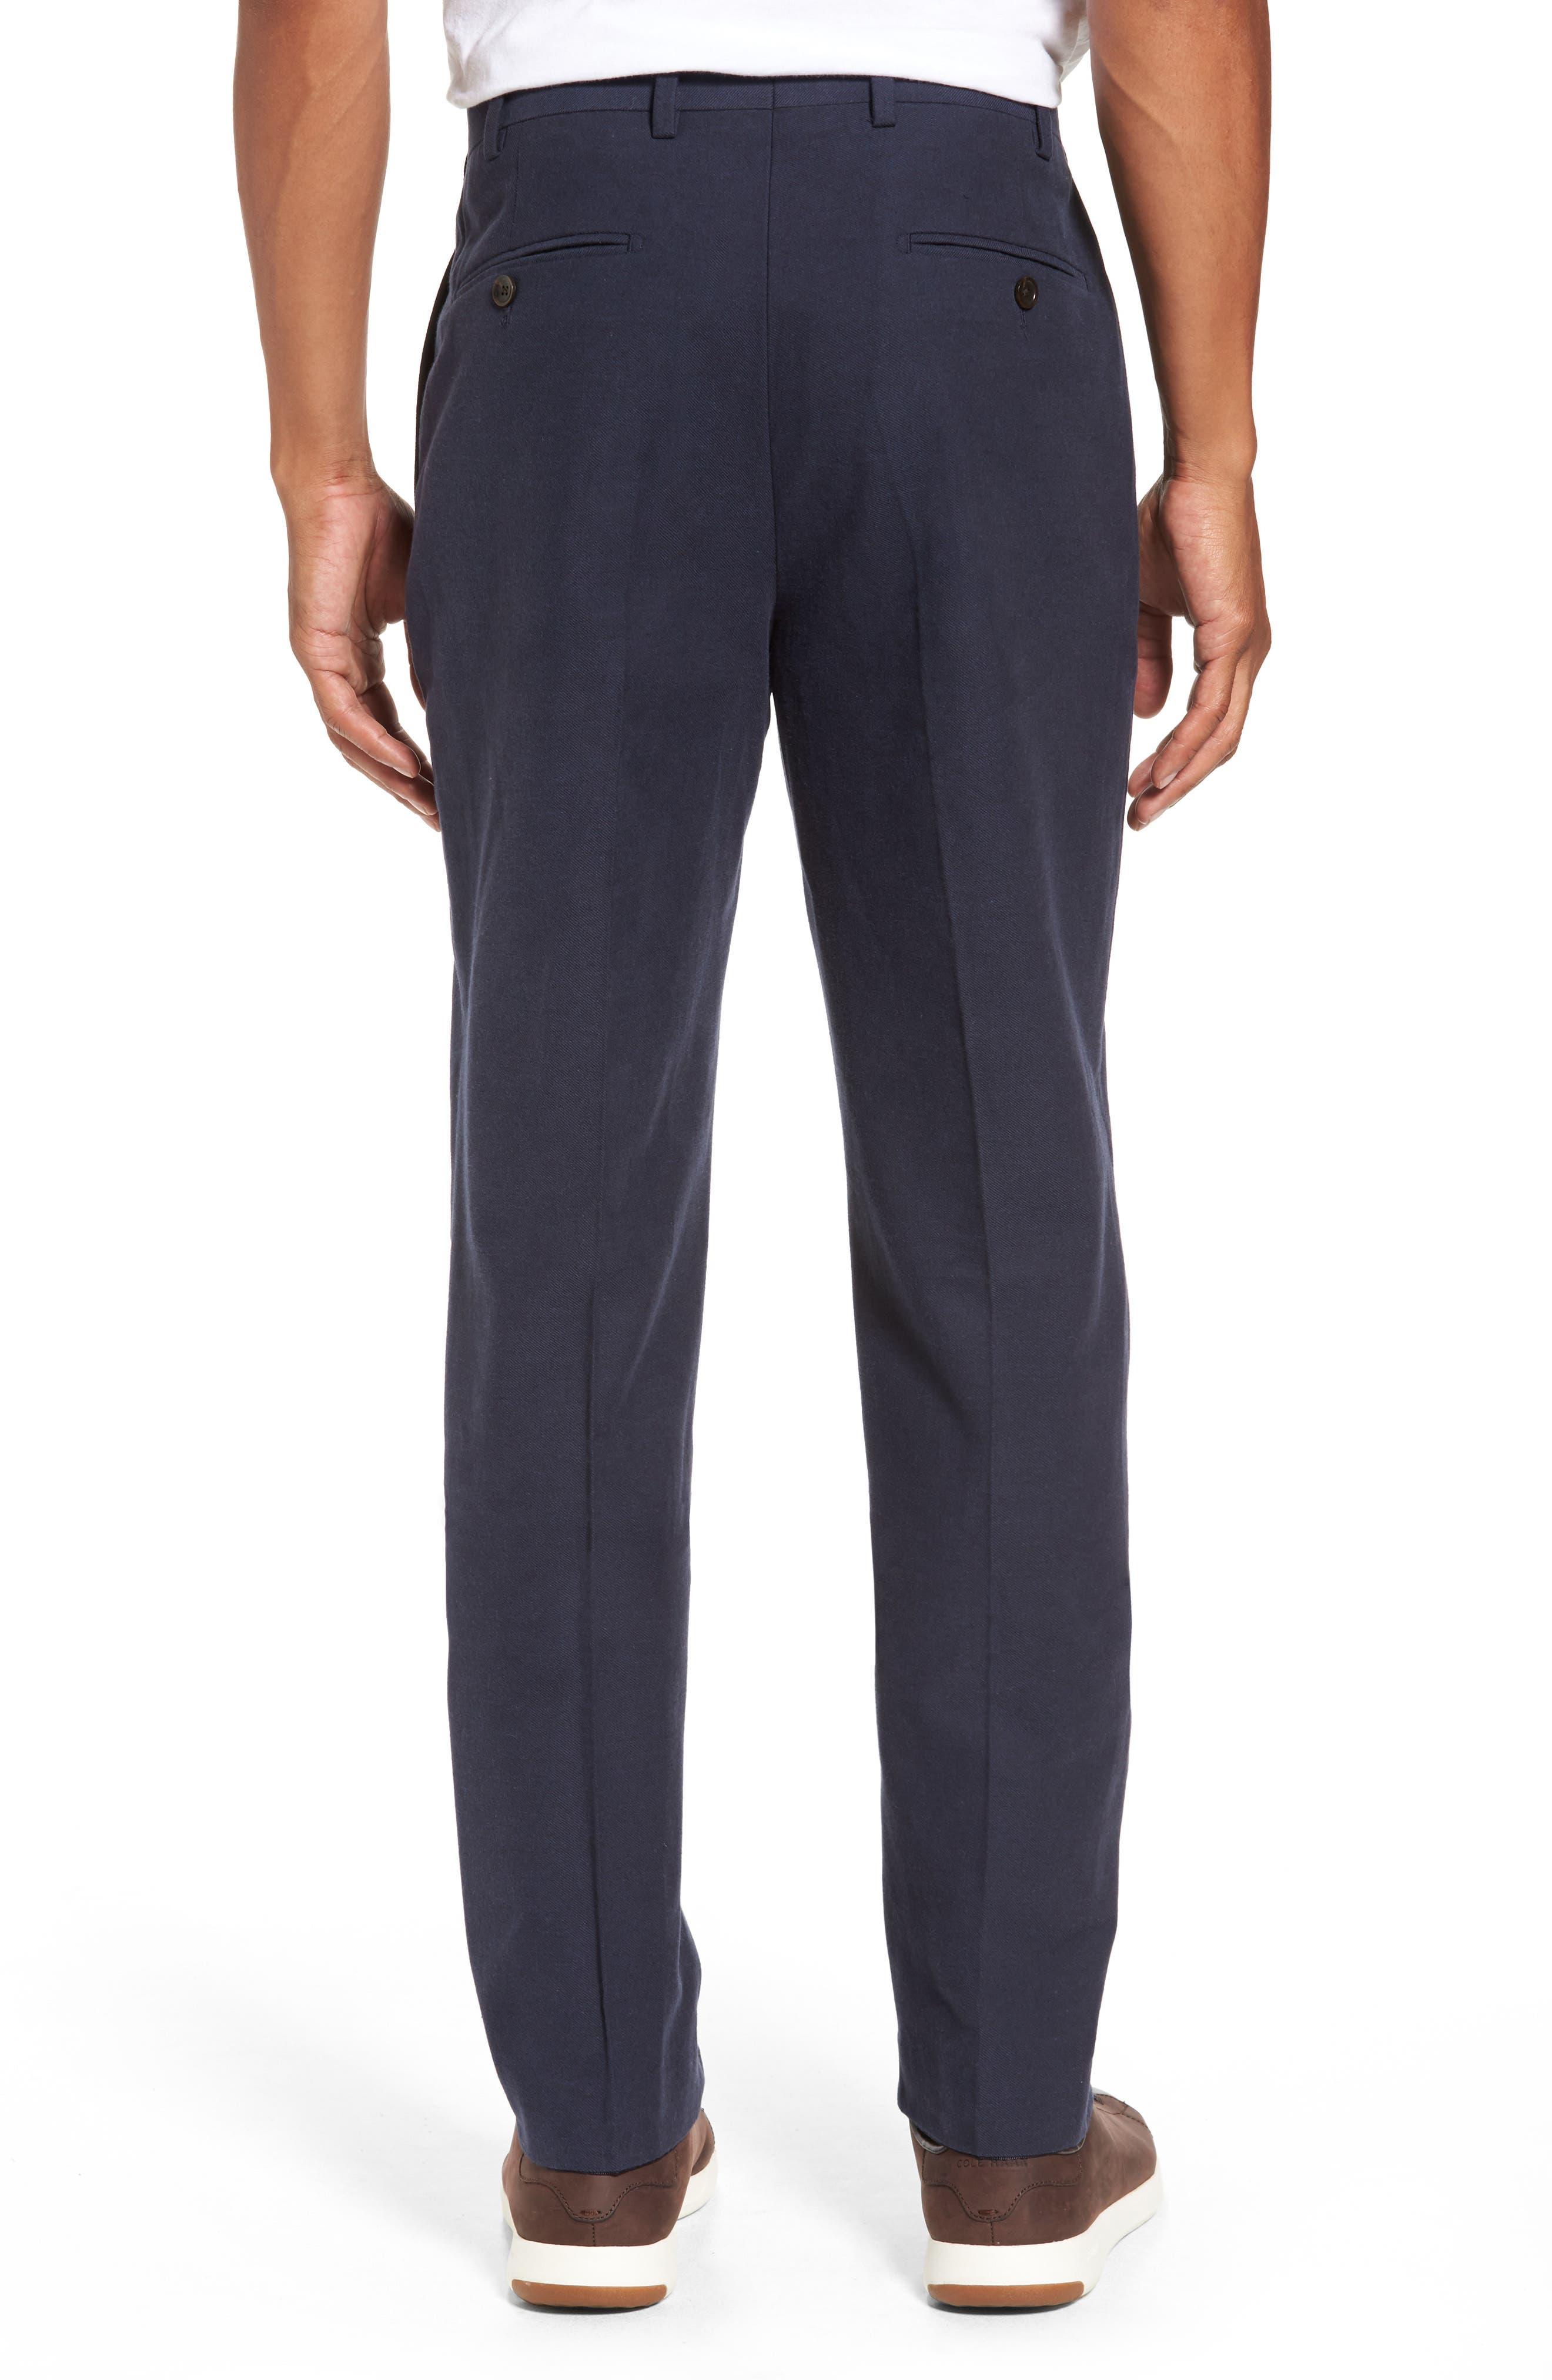 Pembroke Slim Fit Twill Pants,                             Alternate thumbnail 2, color,                             410